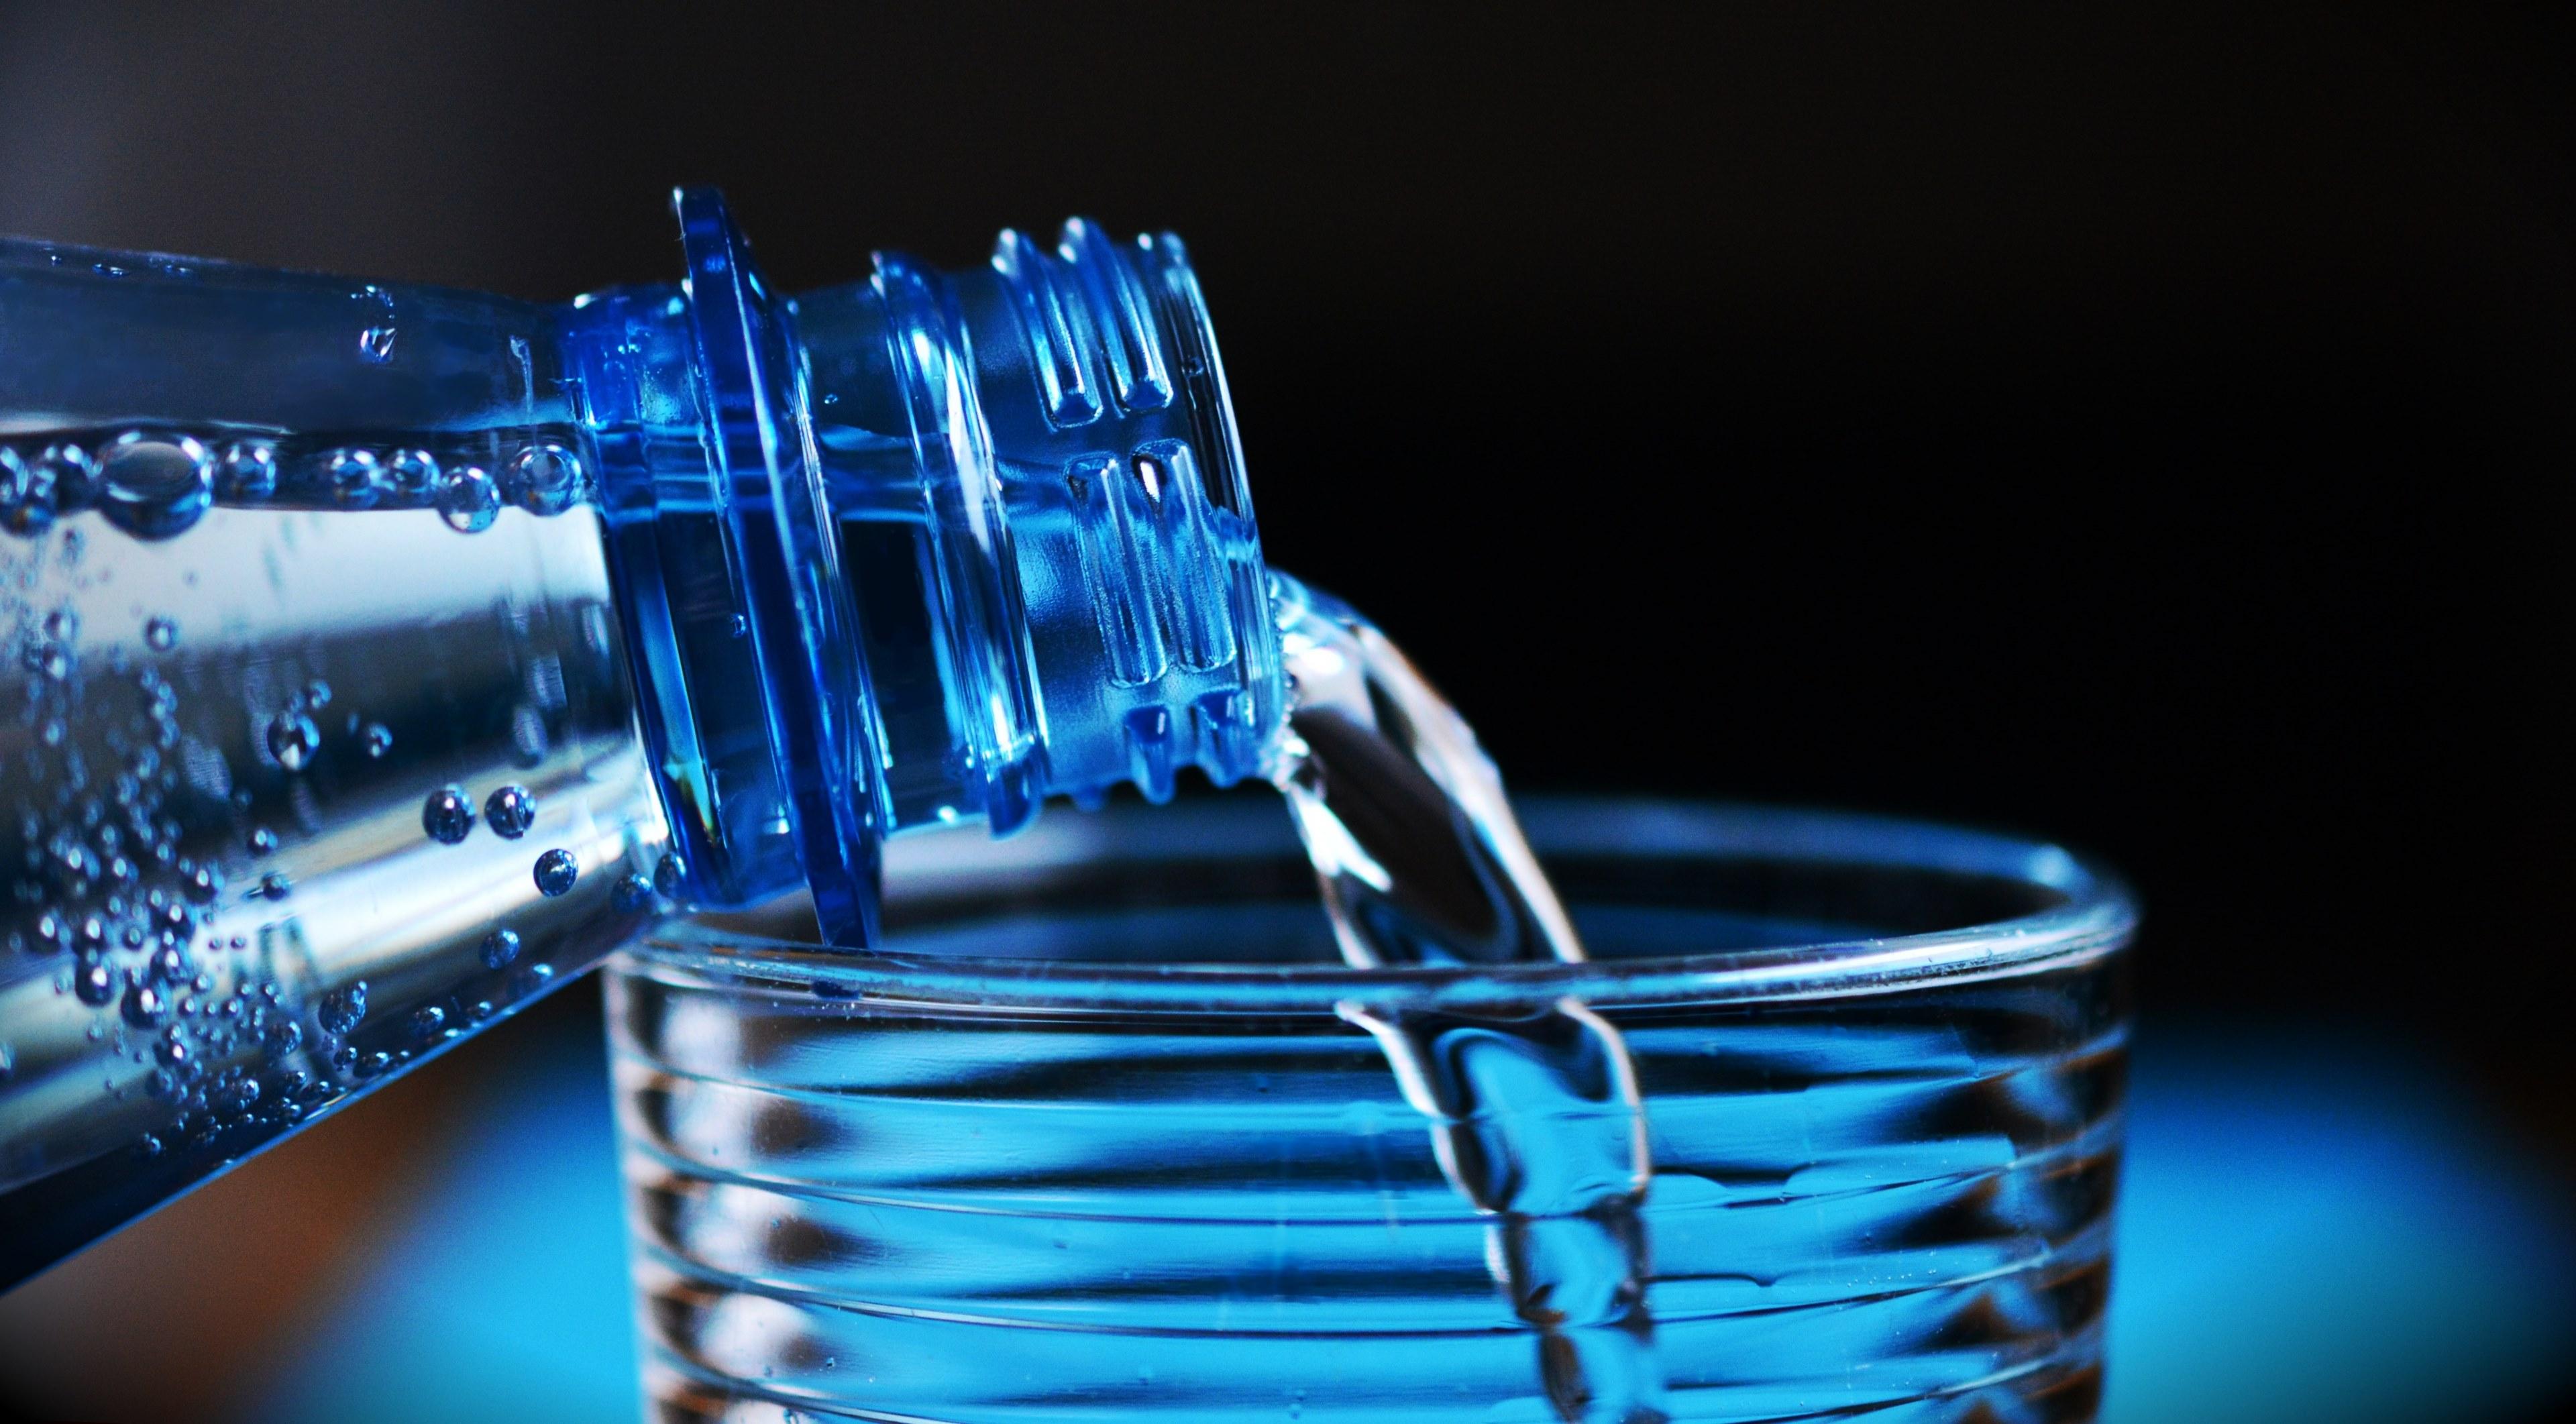 bottled water widescreen wallpaper background 63551